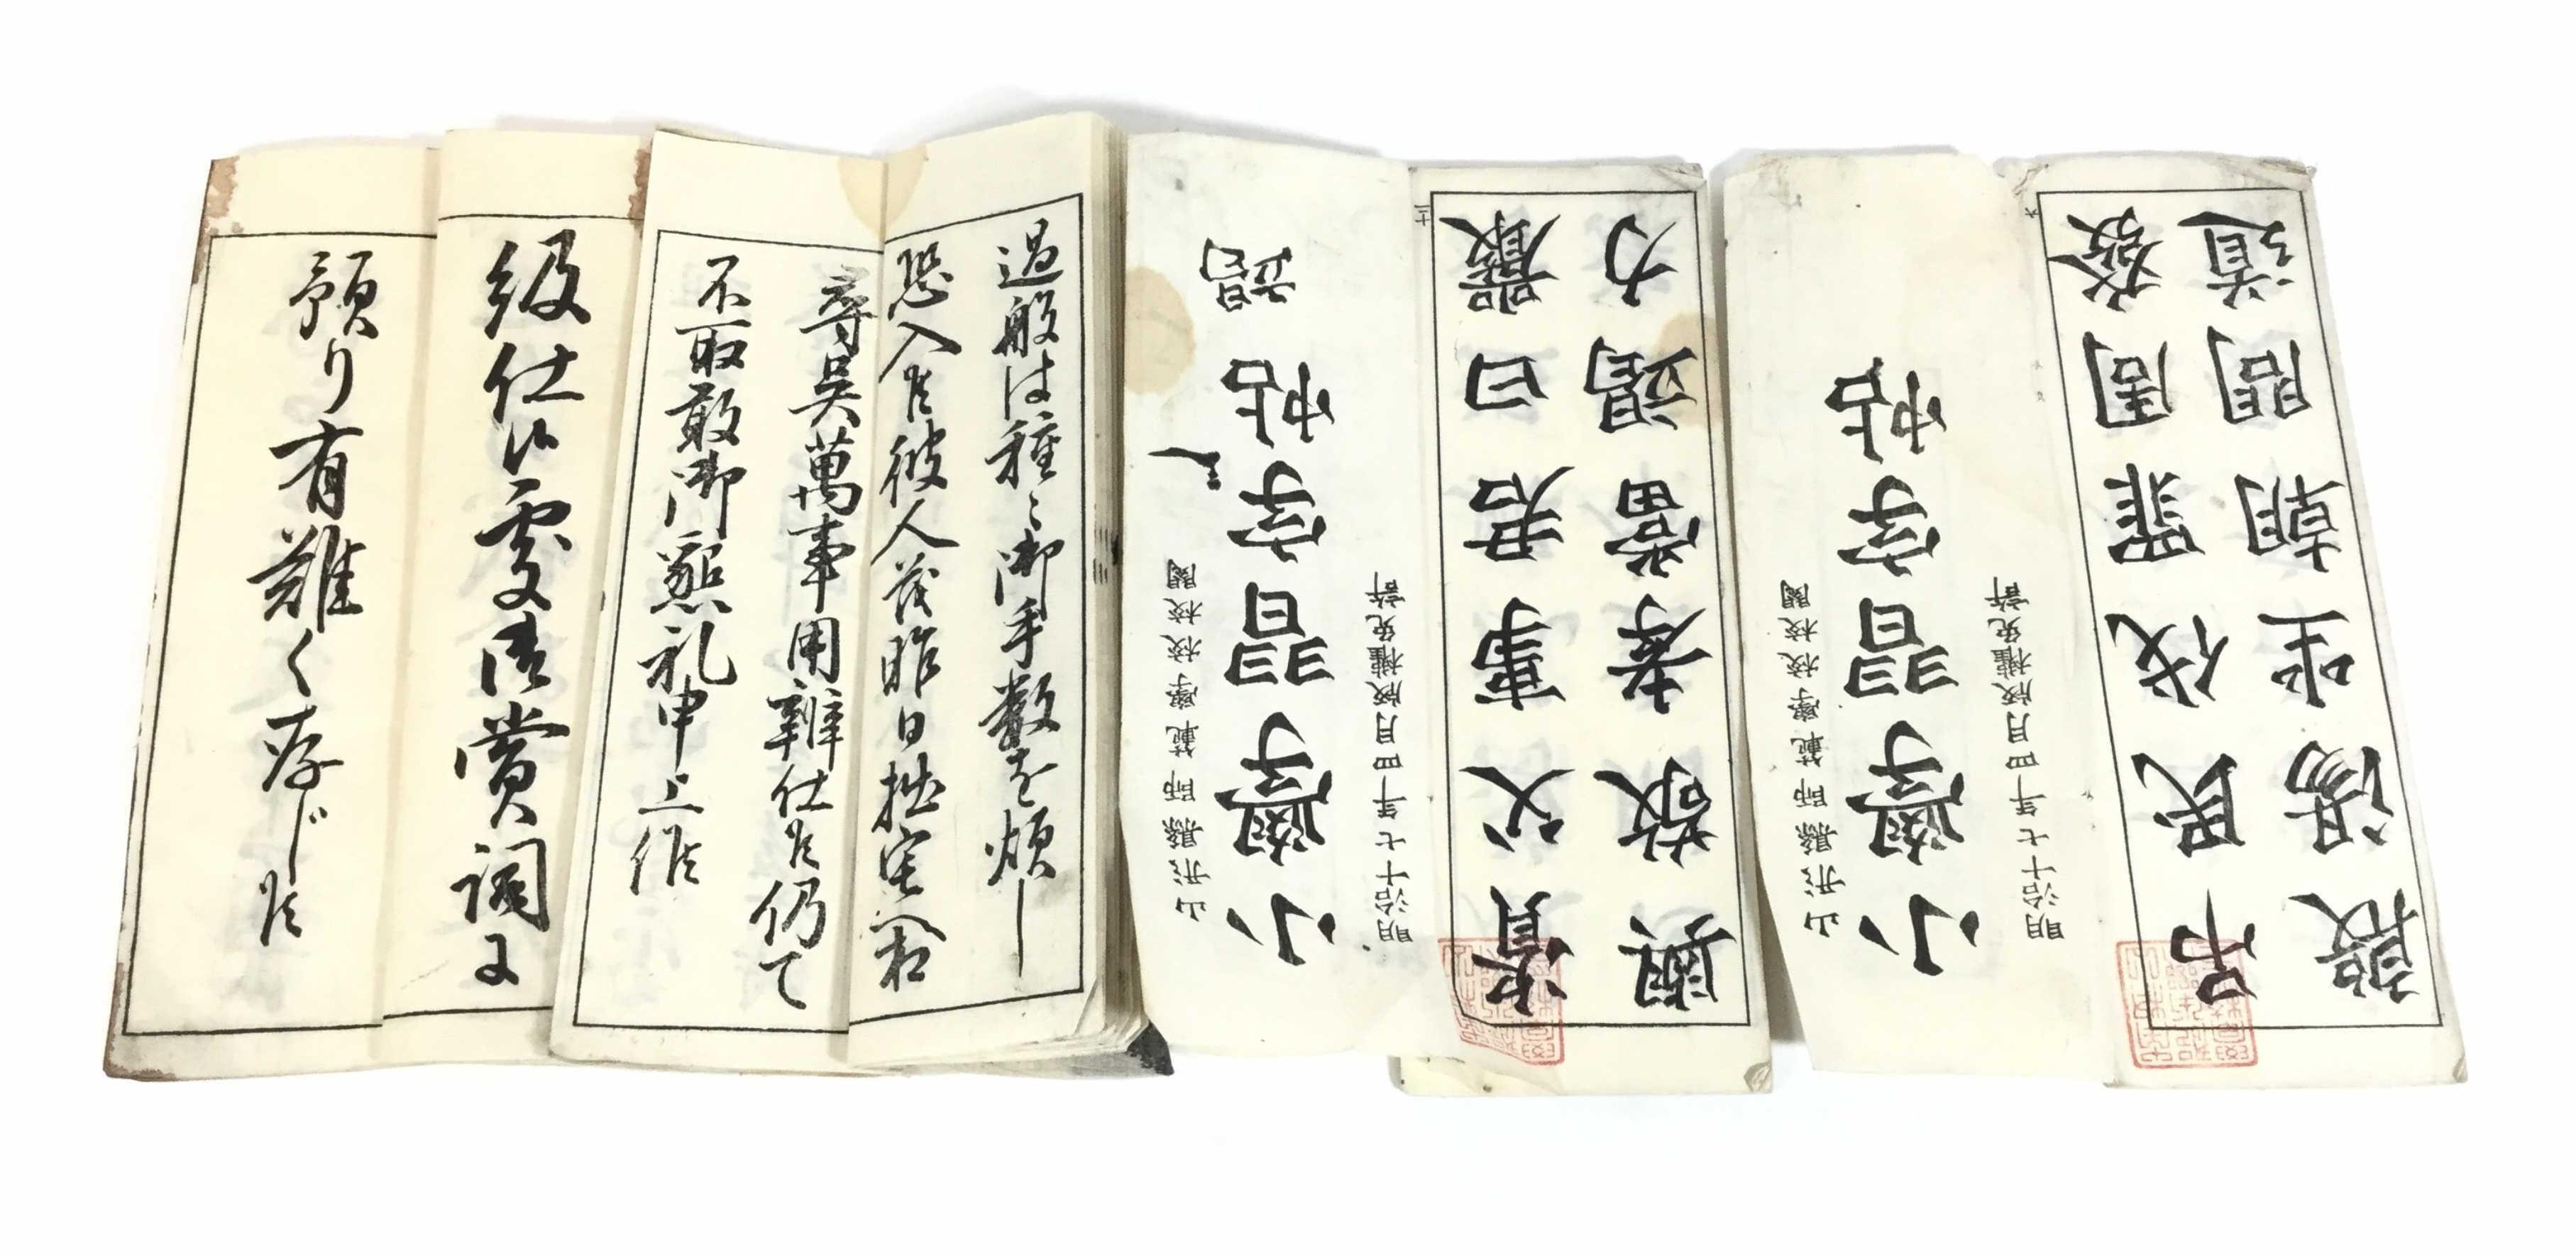 19th C. Japanese Woodblock Print Books